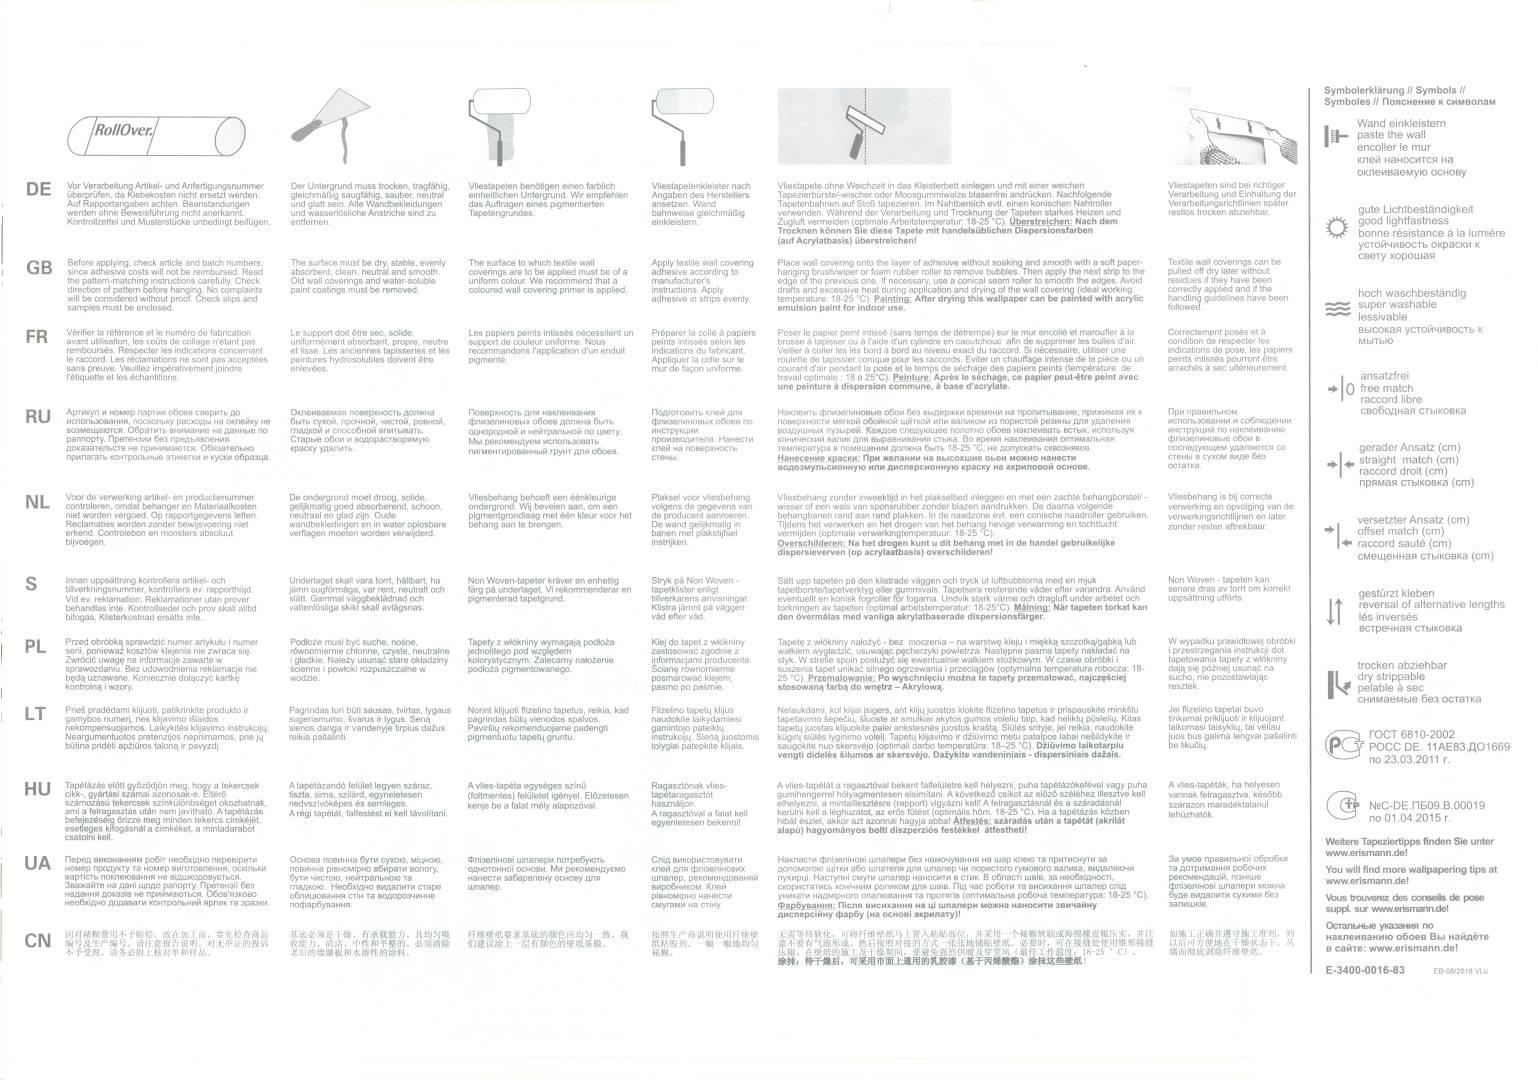 erismann RollOver Basis-Vlies, Renovlies-Tapete, 25 x 0,75 m, entspricht 18,75 m², Stärke: 120 g/m² (strong)